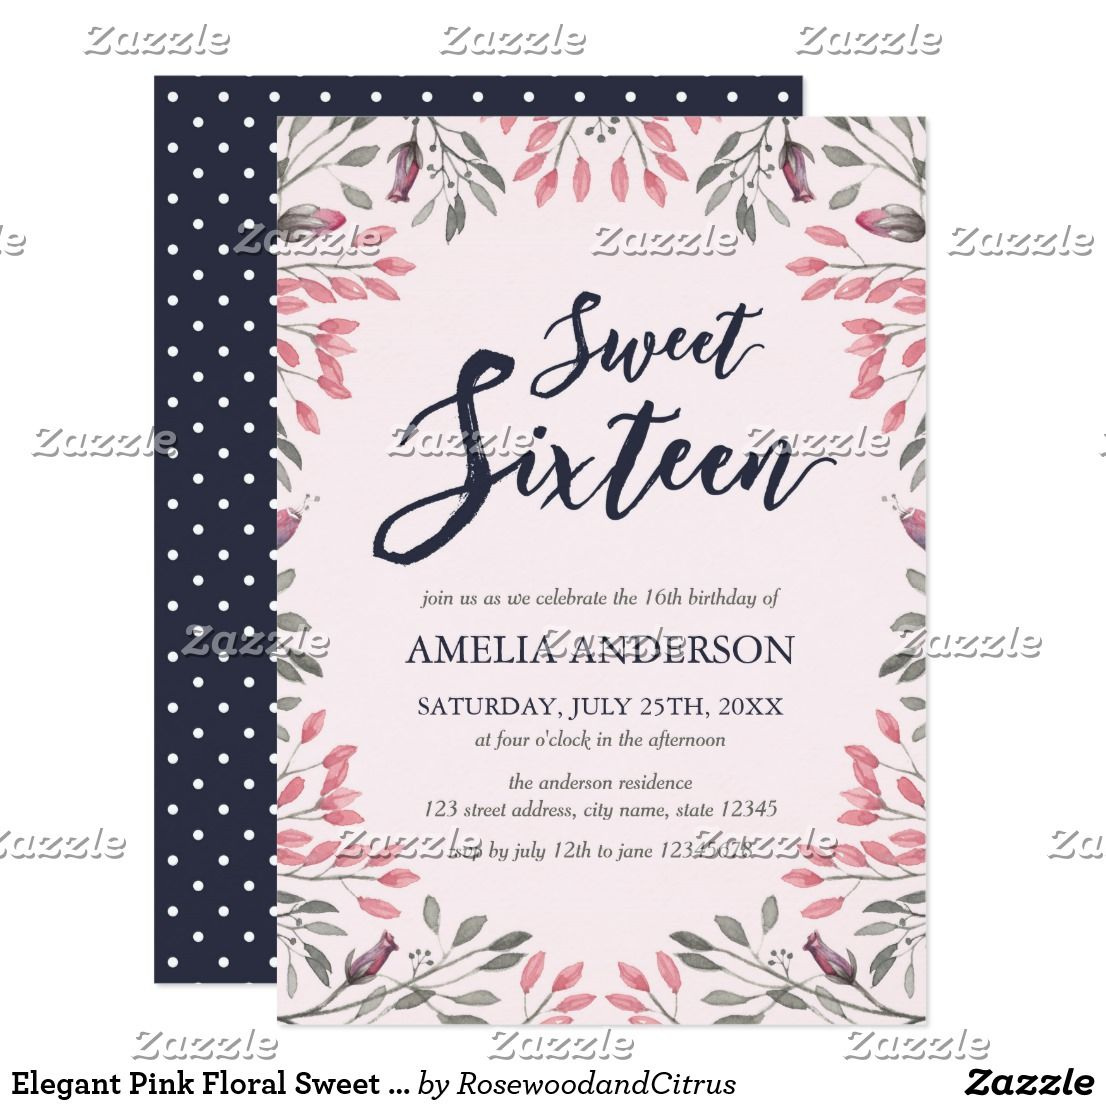 Elegant Pink Floral Sweet 16 Birthday Invitation | Pinterest | Sweet ...